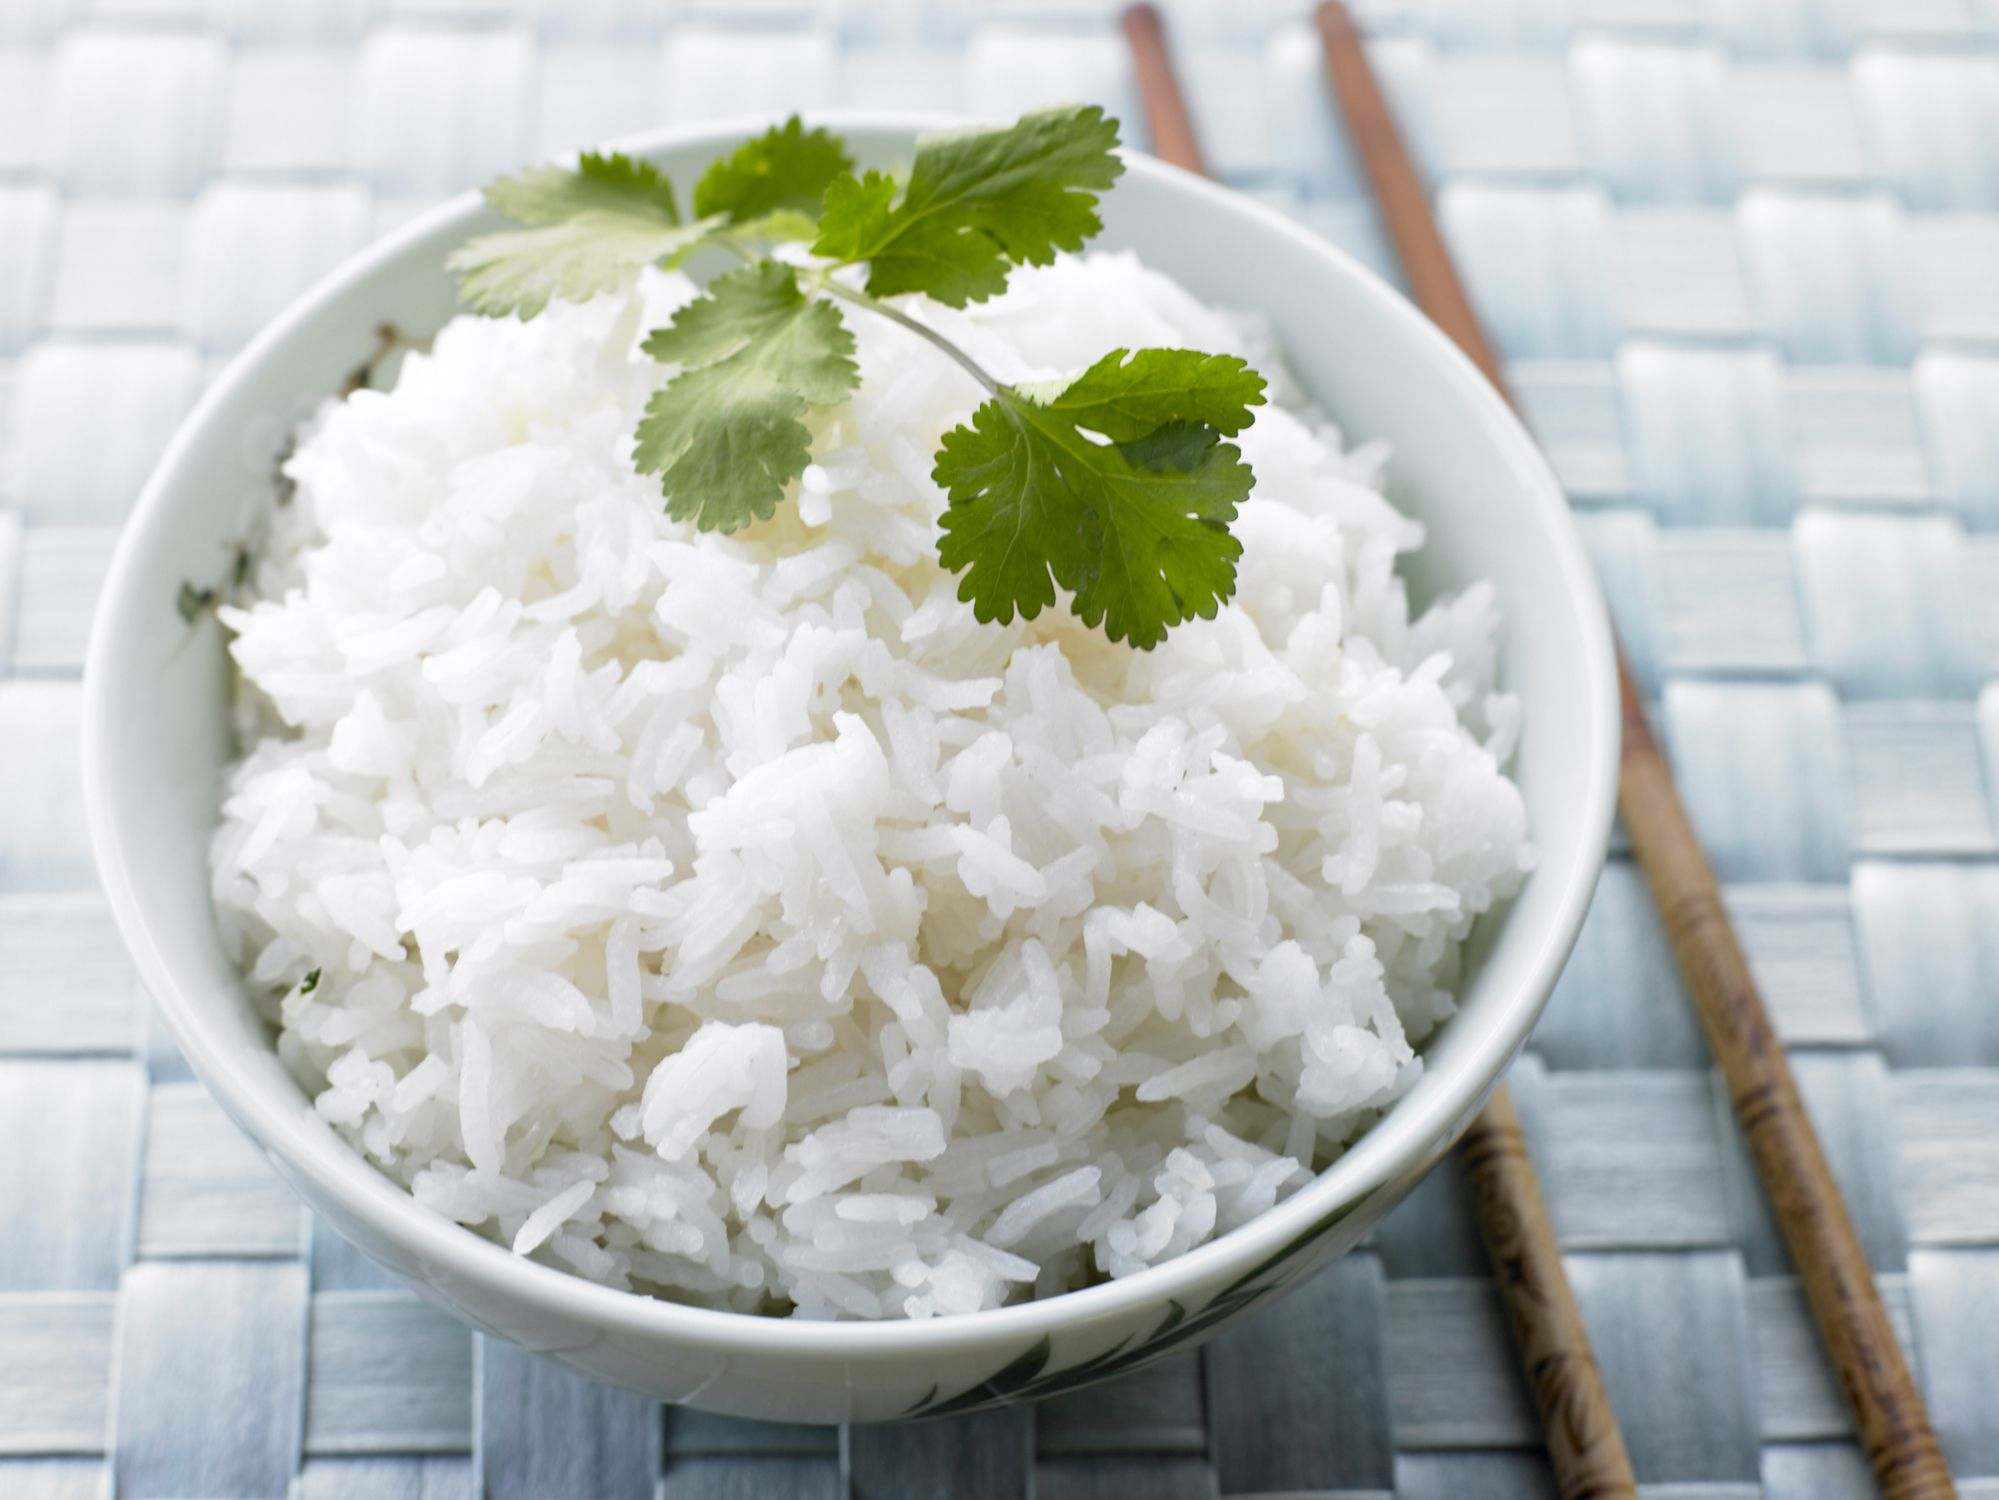 zojirushi rice cooker instructions jasmine rice